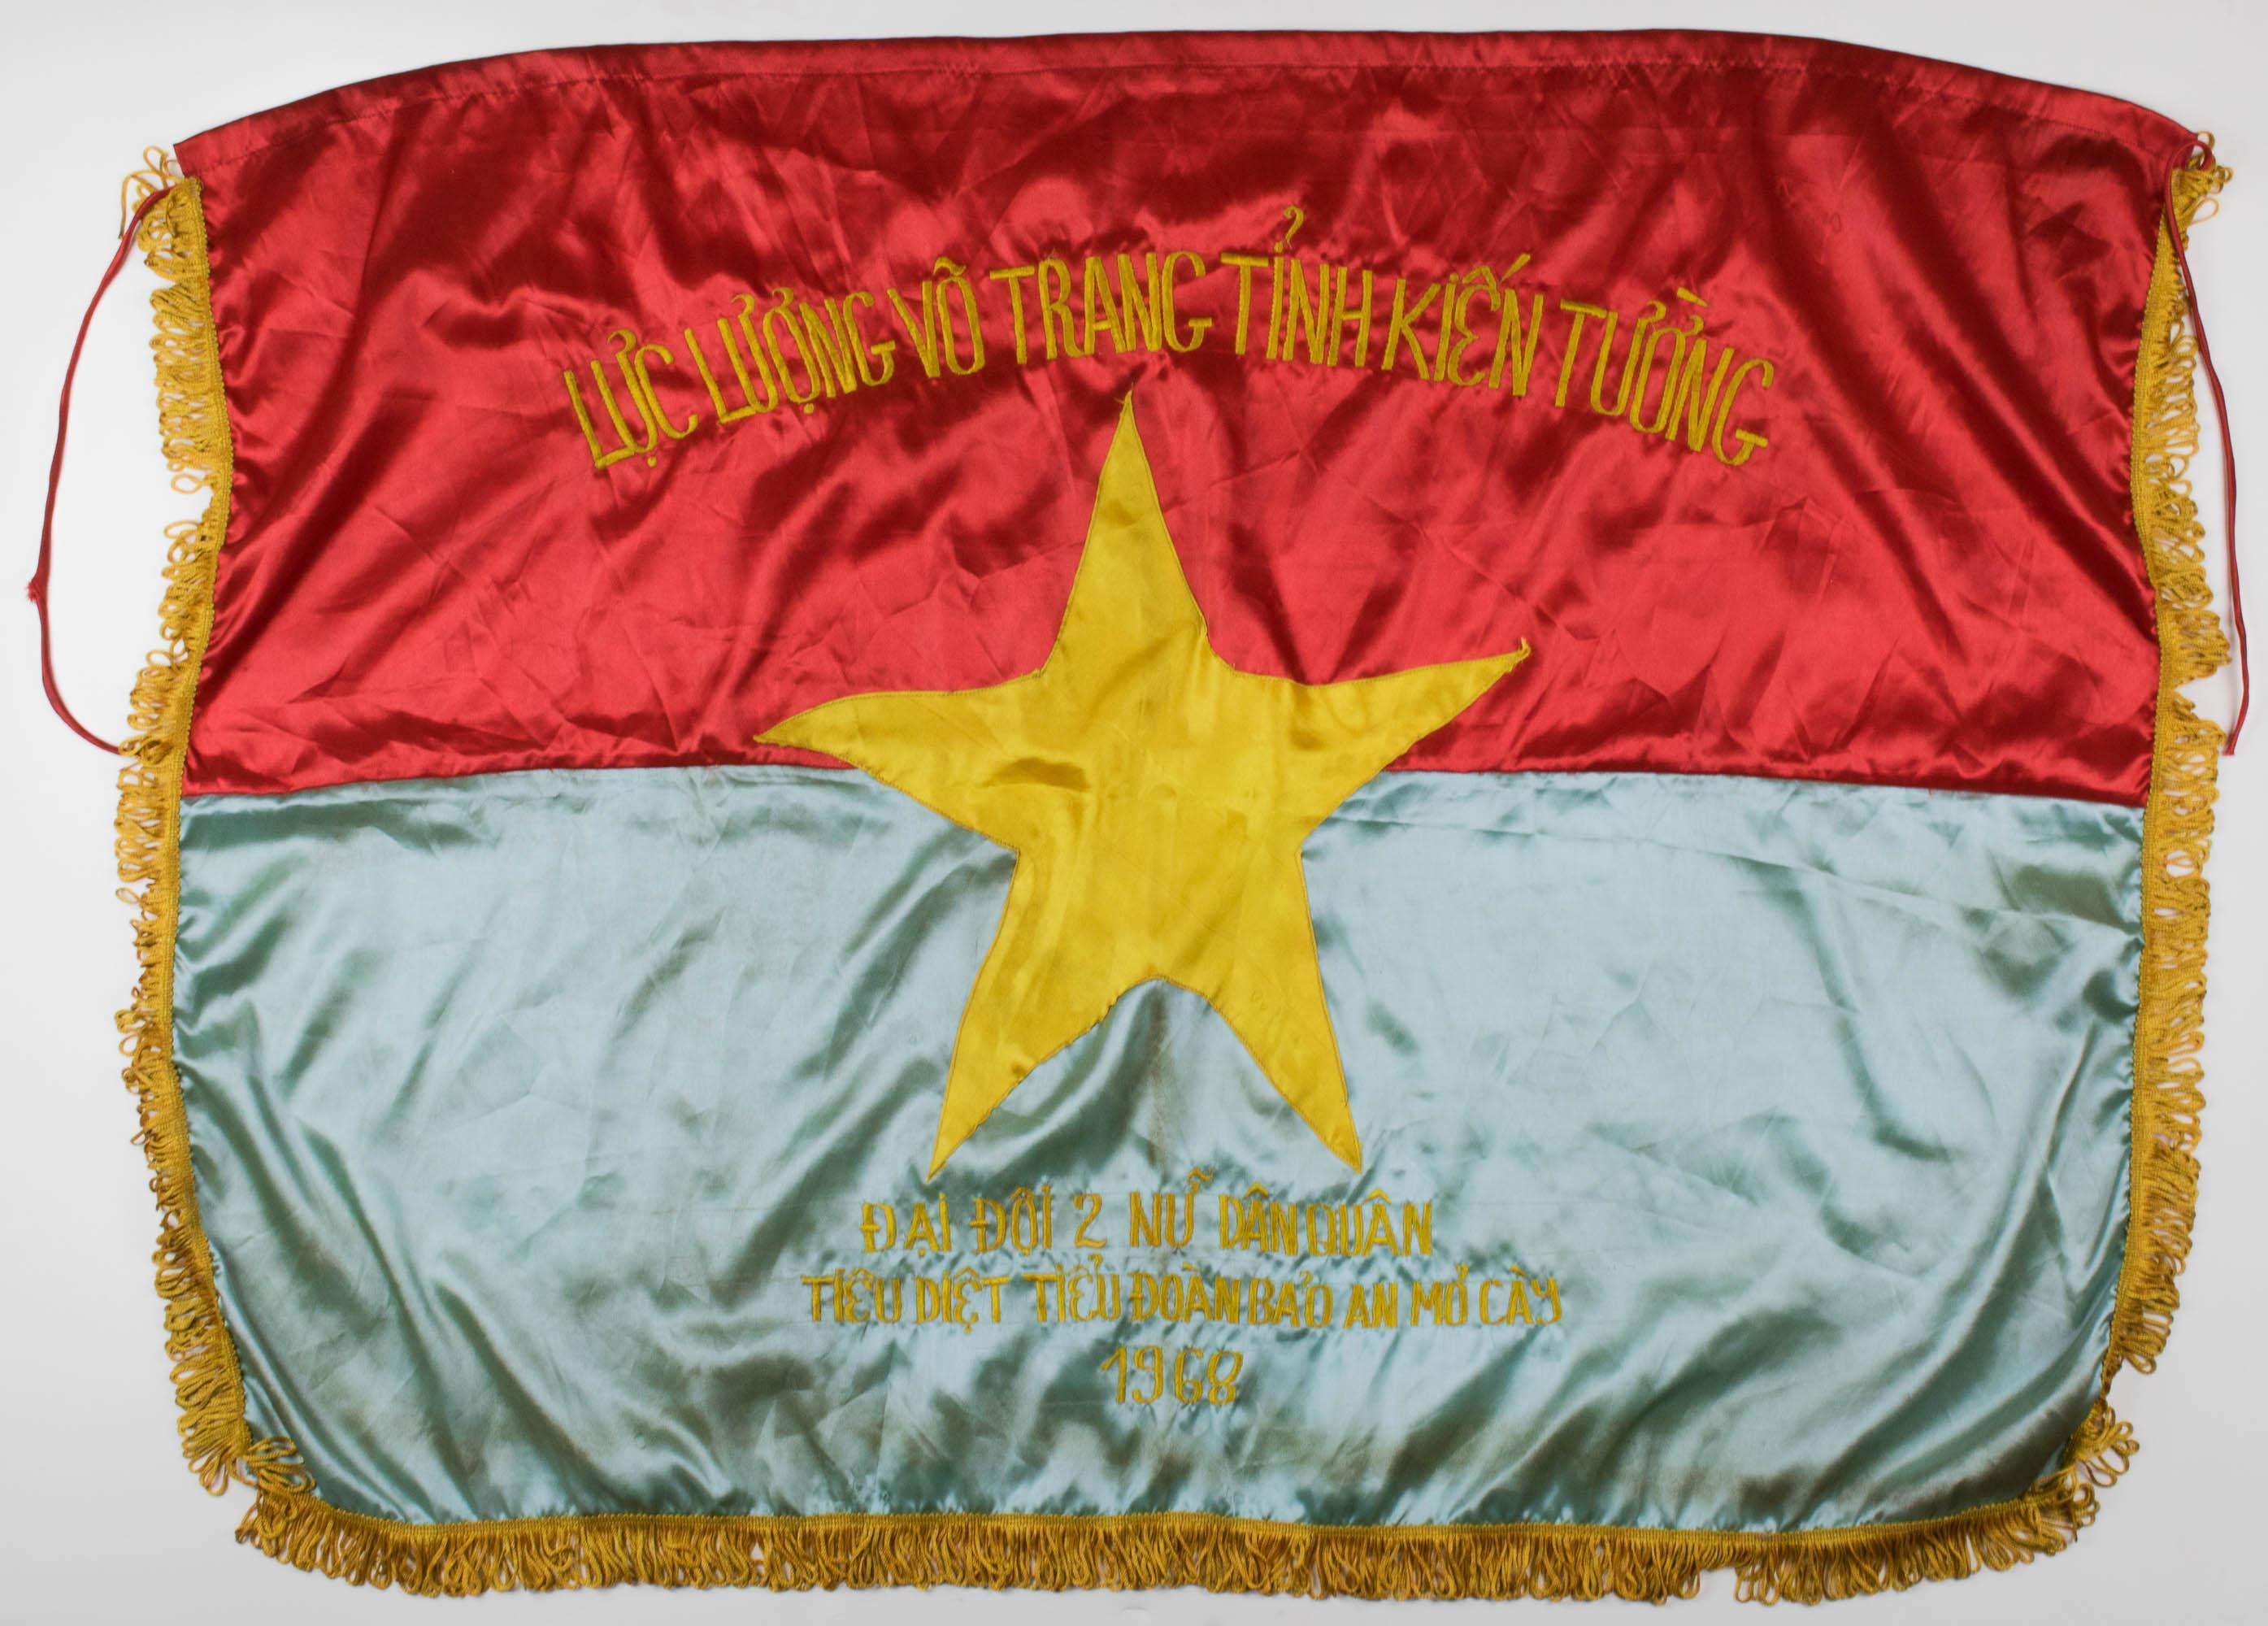 SOUTH VIETNAMESE FEMALE MILITIA BANNER